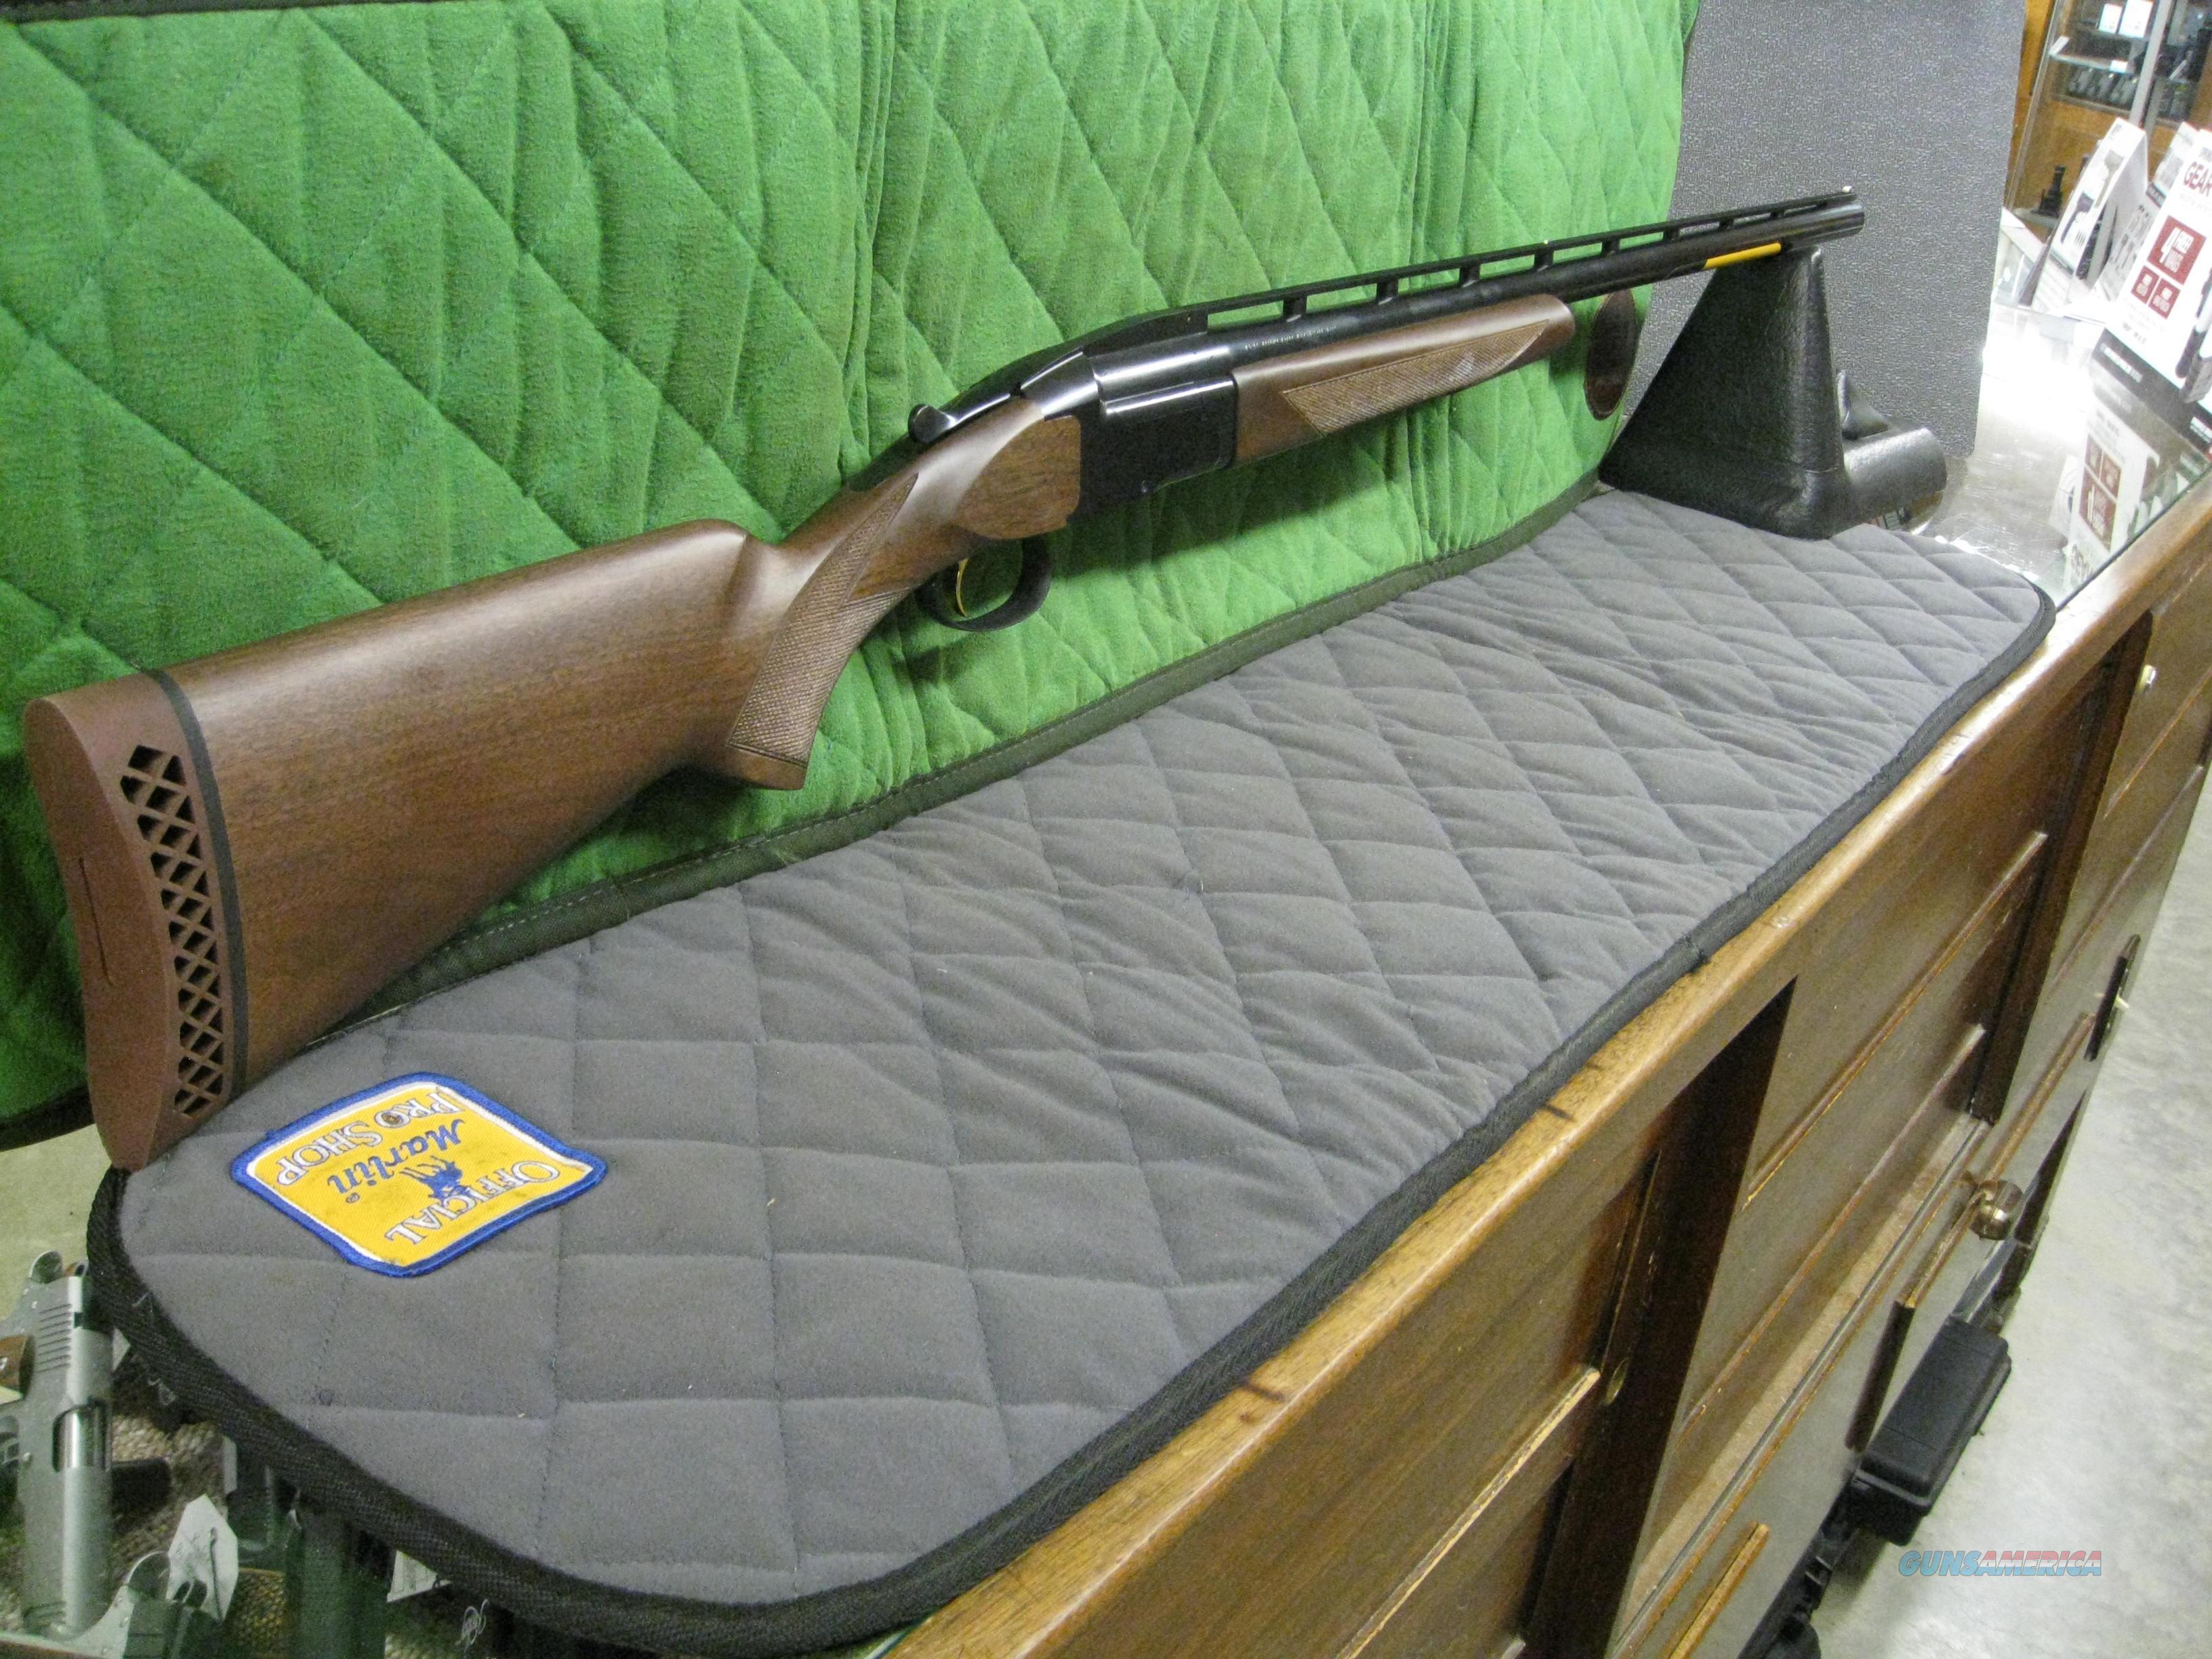 Browning BT-99 Micro Midas 30 Inch  **NEW**  Guns > Shotguns > Browning Shotguns > Single Barrel